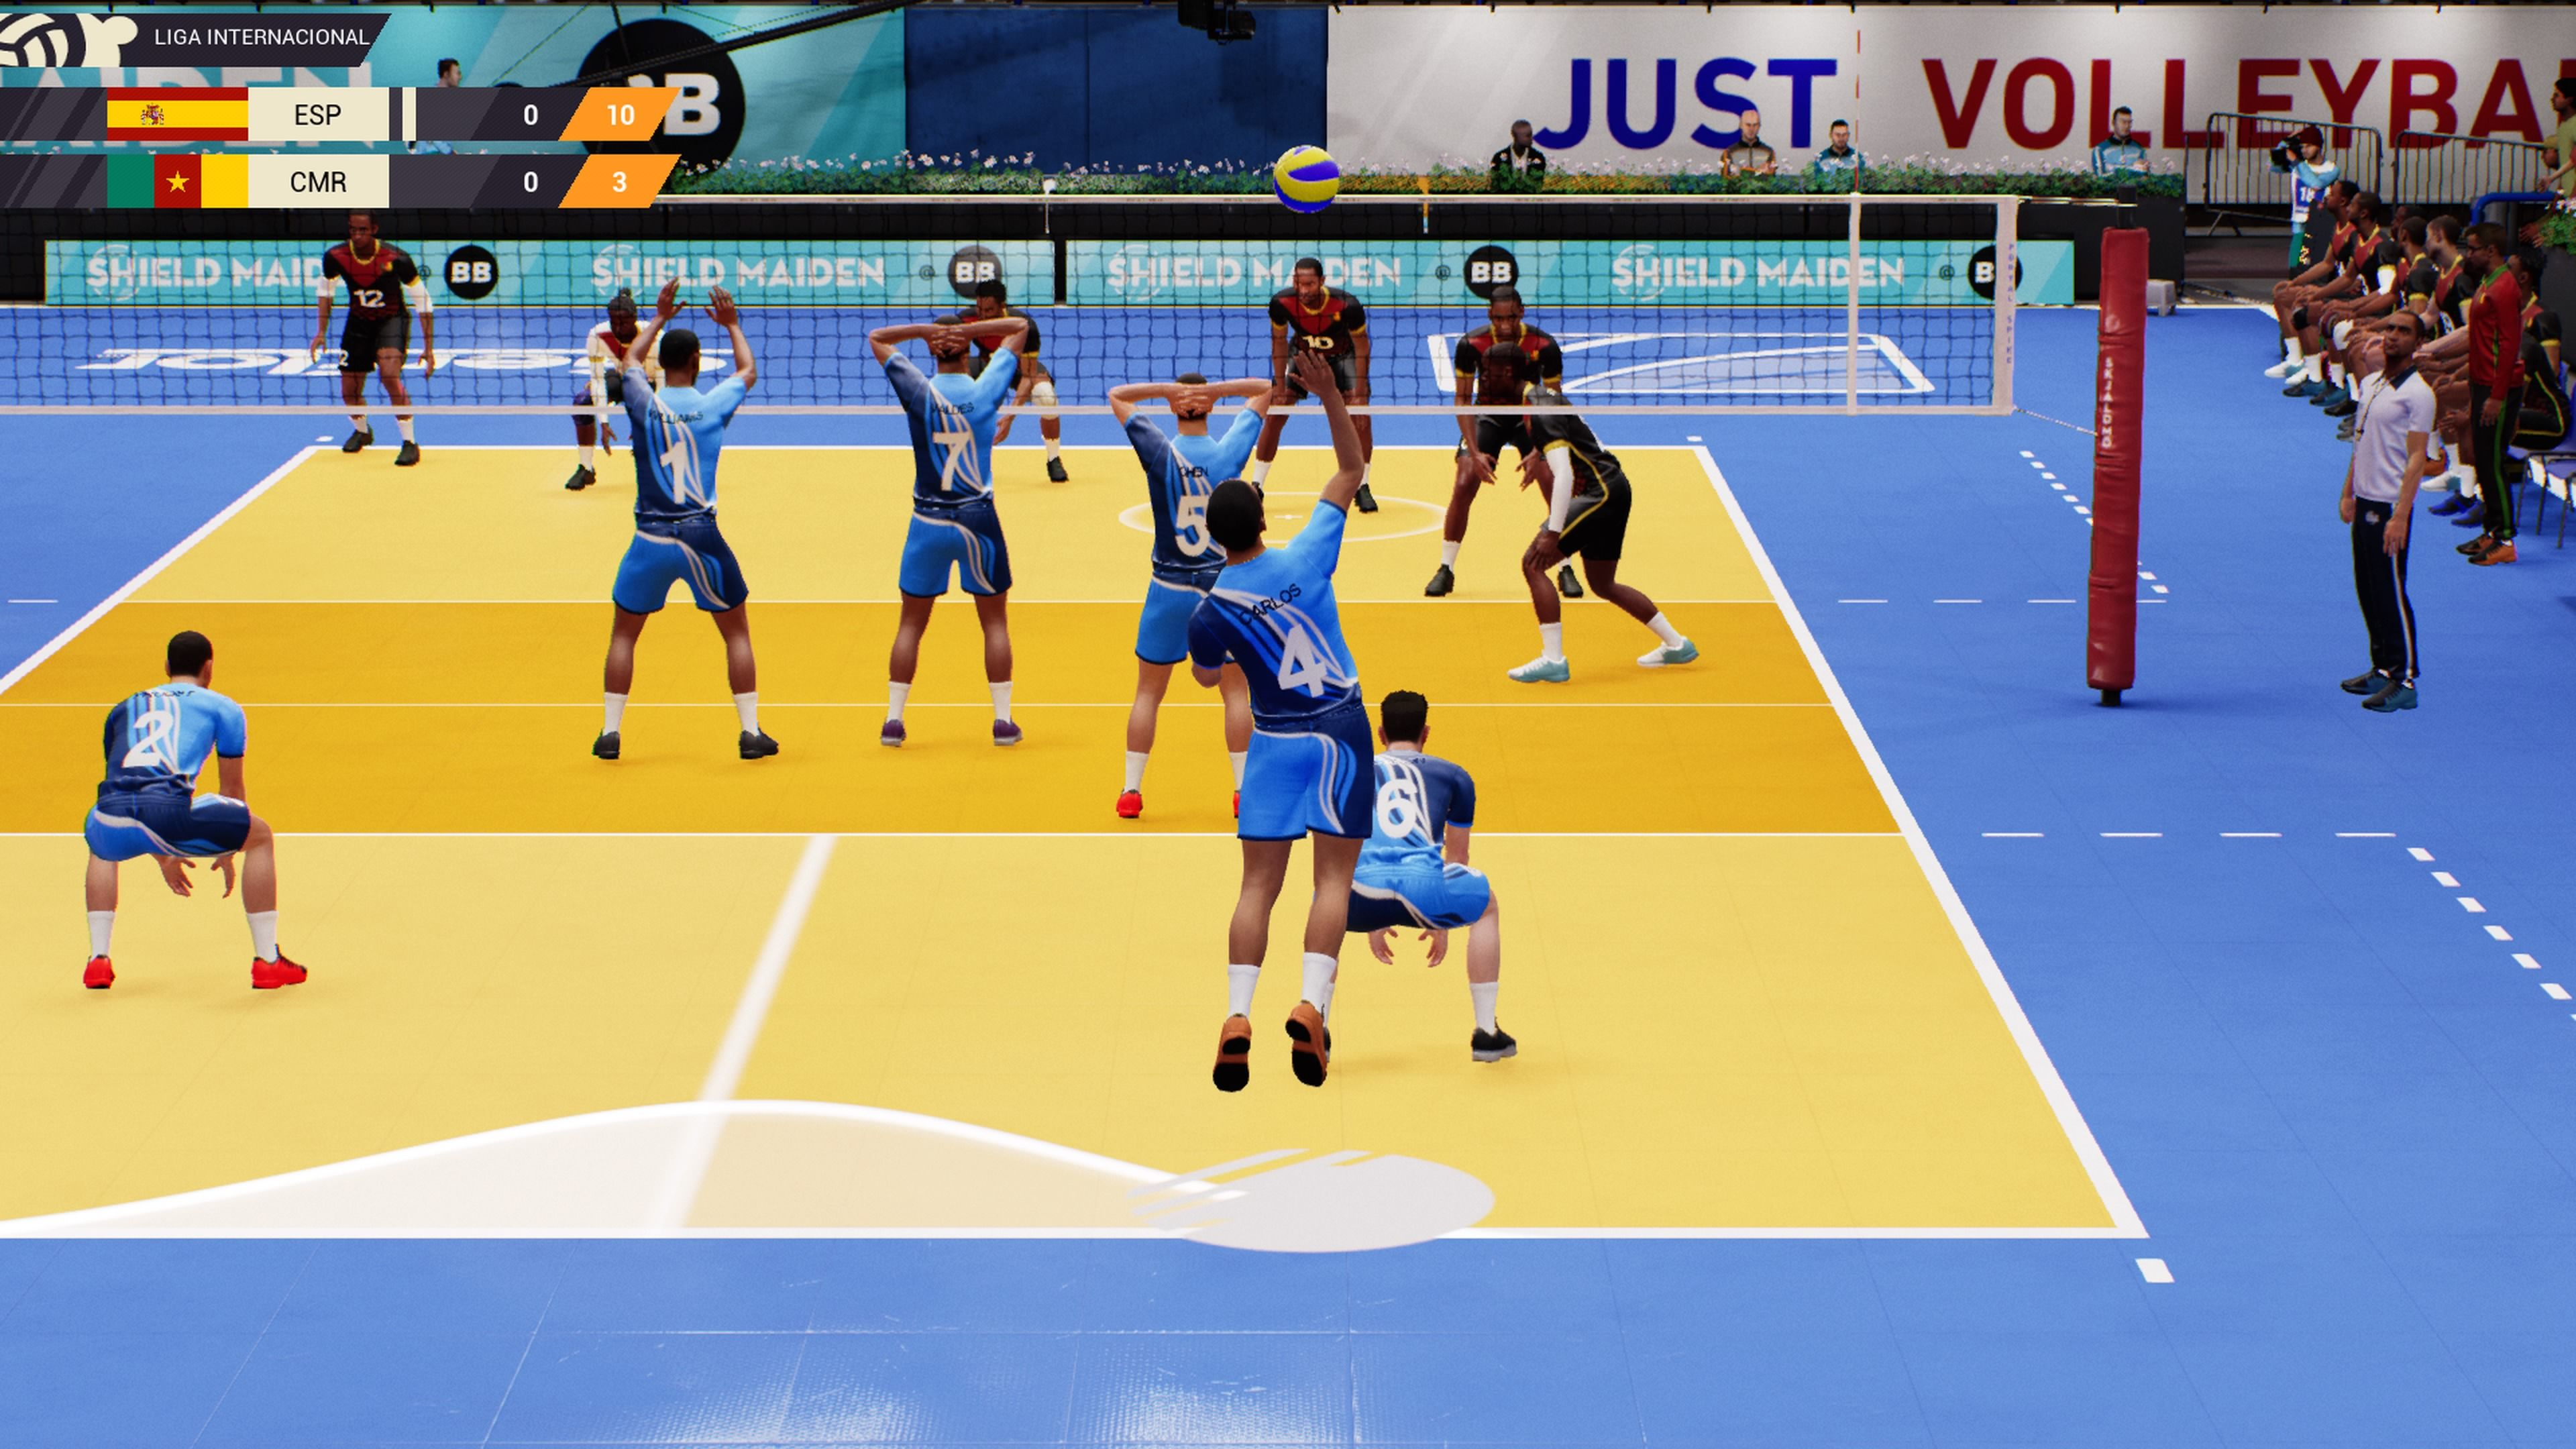 Spike Volleyball Versi/ón Espa/ñola